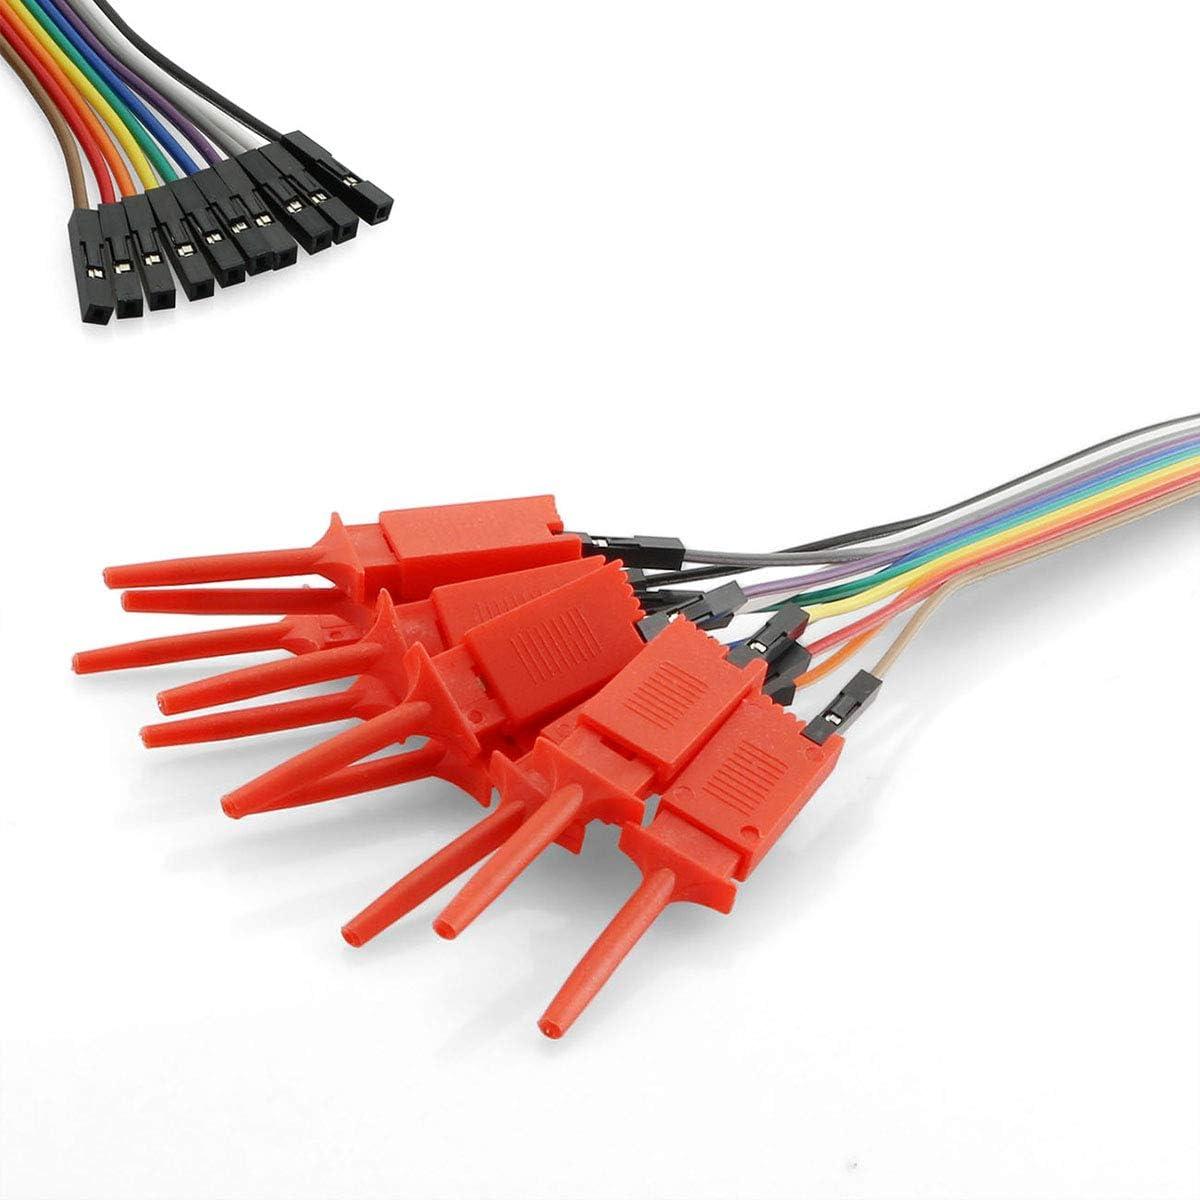 Max 47% OFF MagicShell Red Test Probe Hook 10 Mini Grabber Flat 1 in Logic security